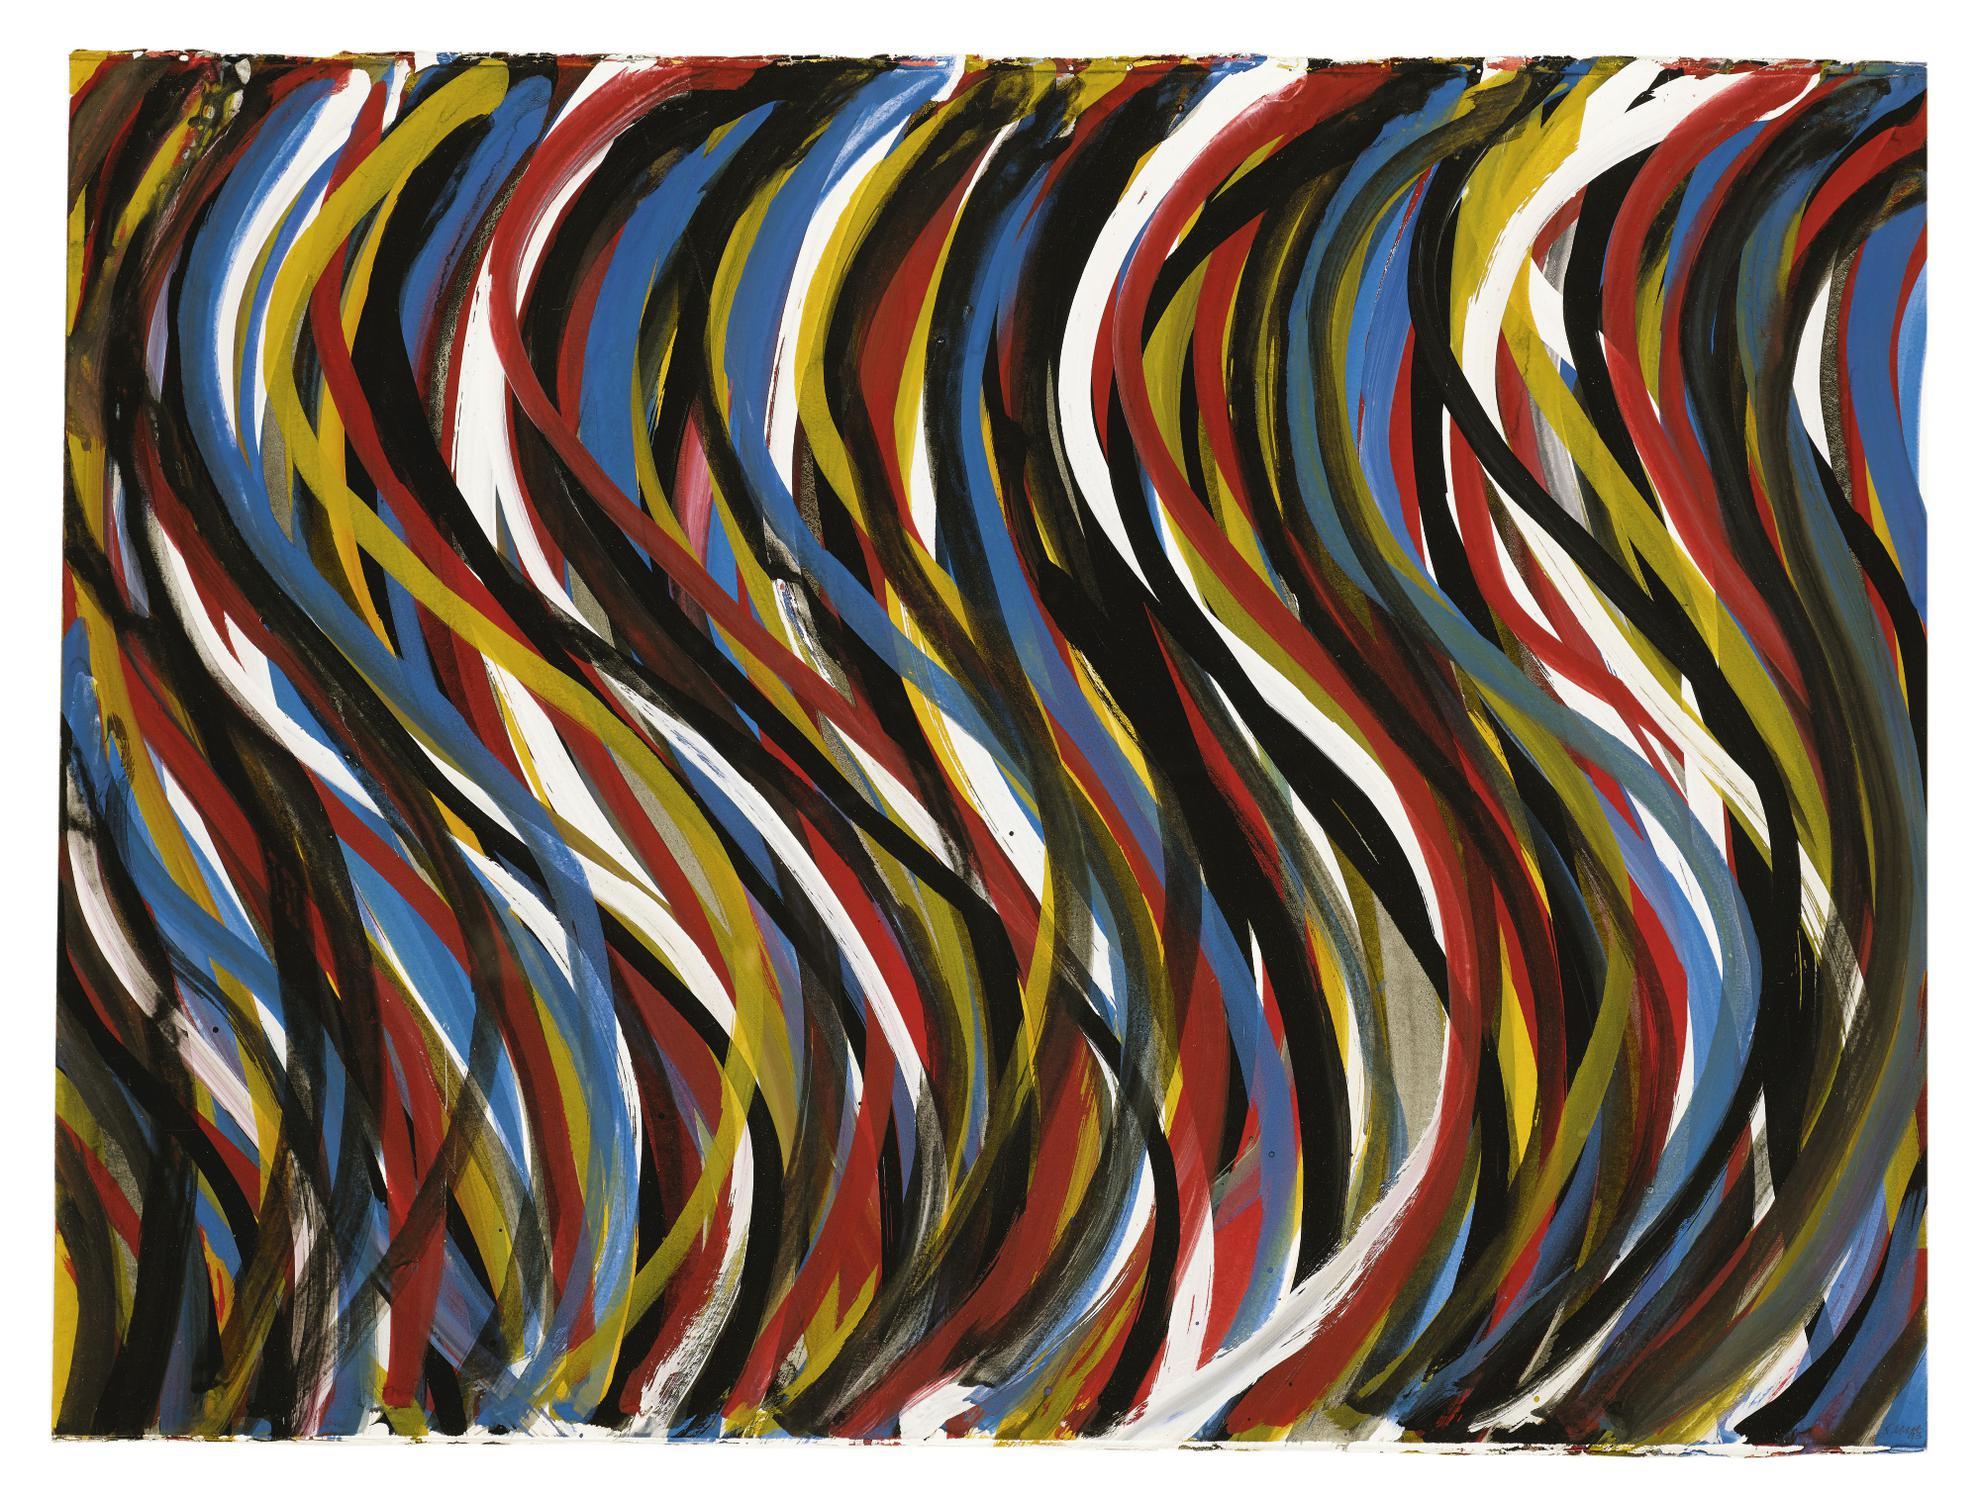 Sol LeWitt-Irregular Vertical Brushstrokes With Colors Superimposed-1993